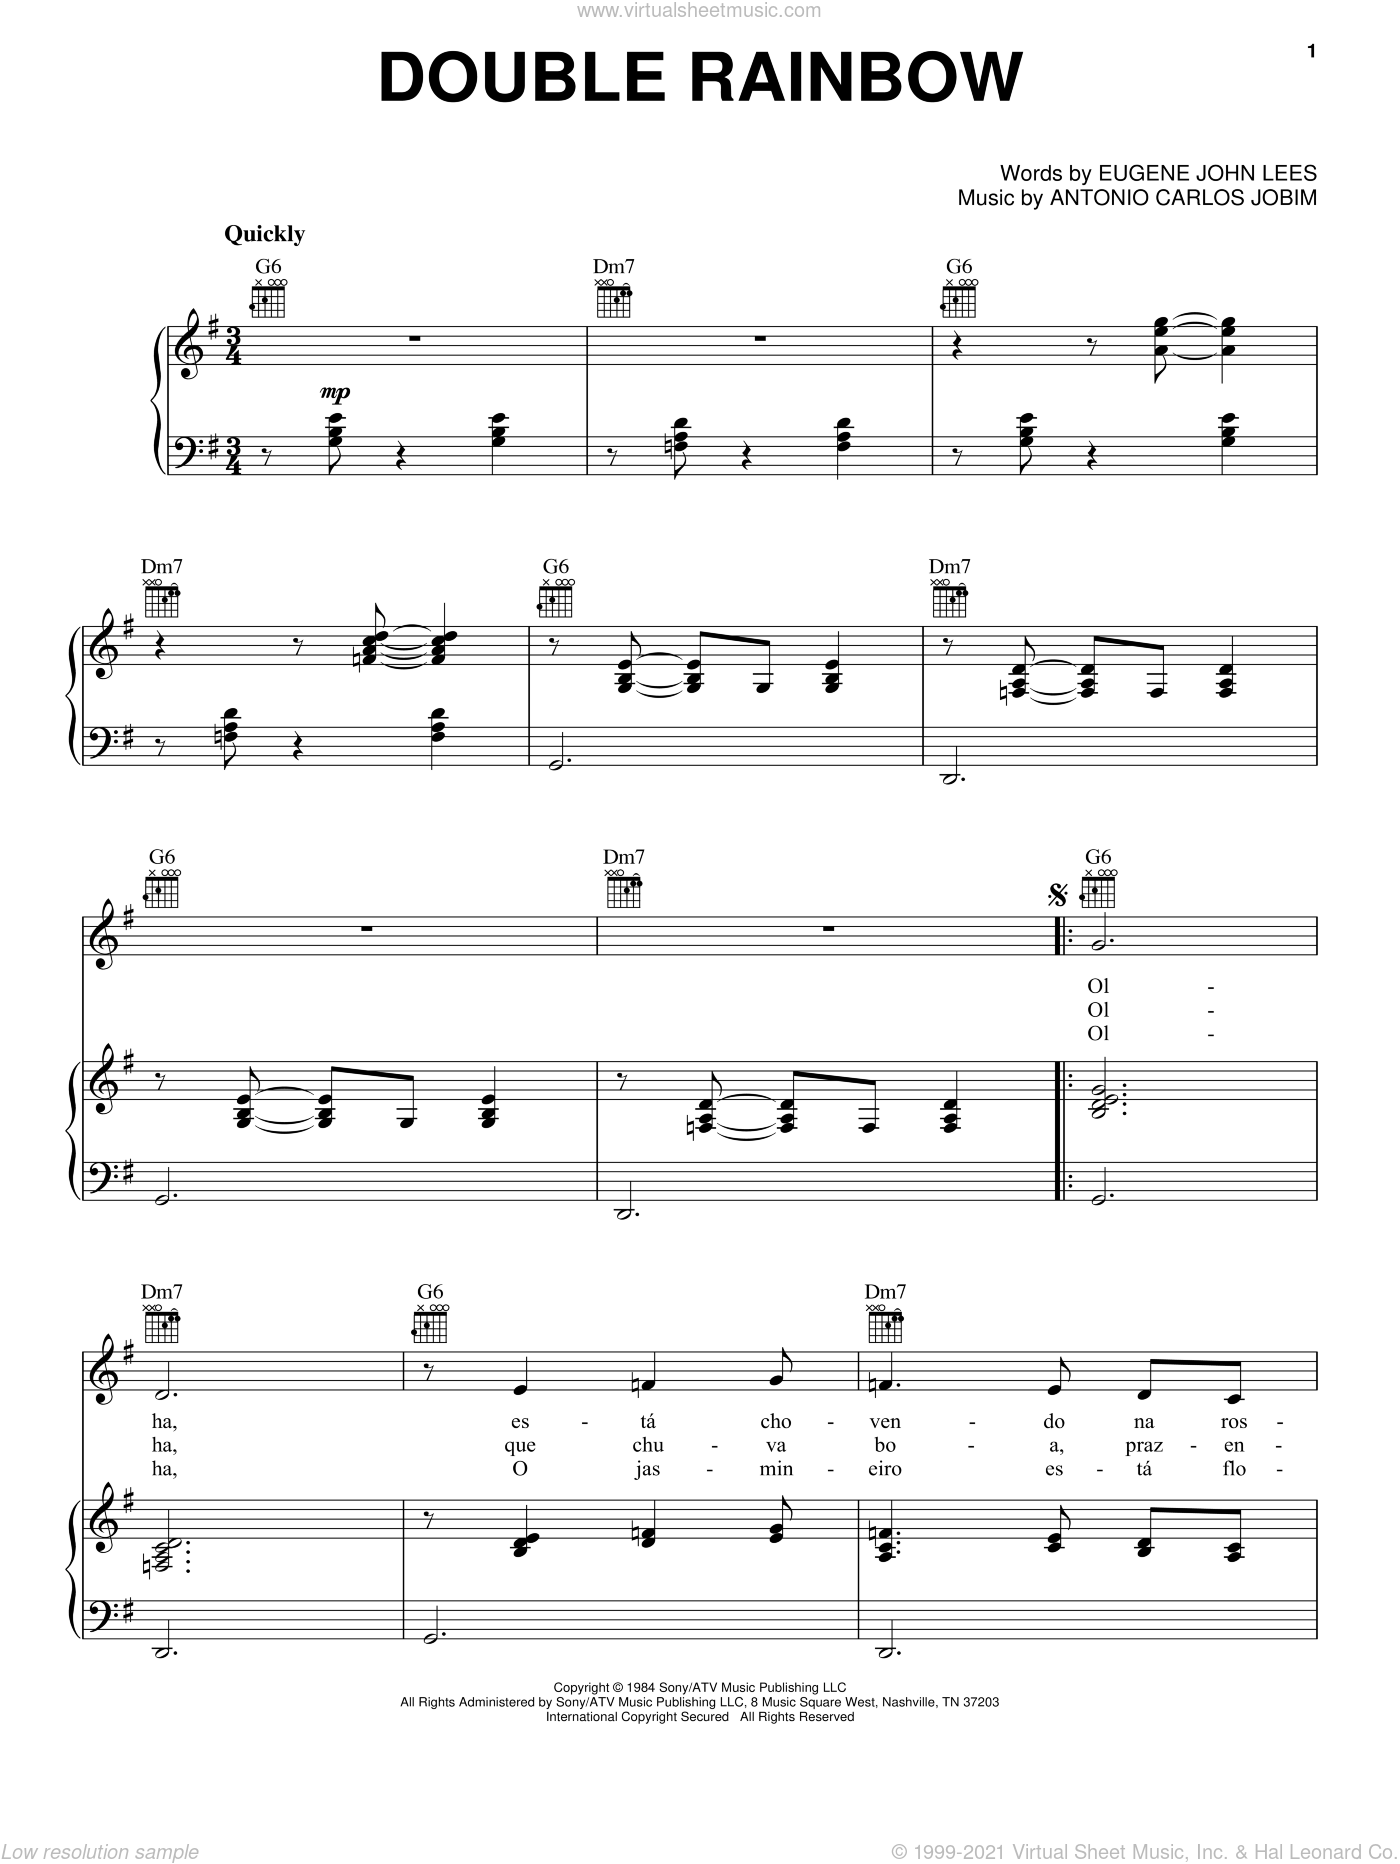 Double Rainbow sheet music for voice, piano or guitar by Antonio Carlos Jobim and Eugene John Lees, intermediate skill level